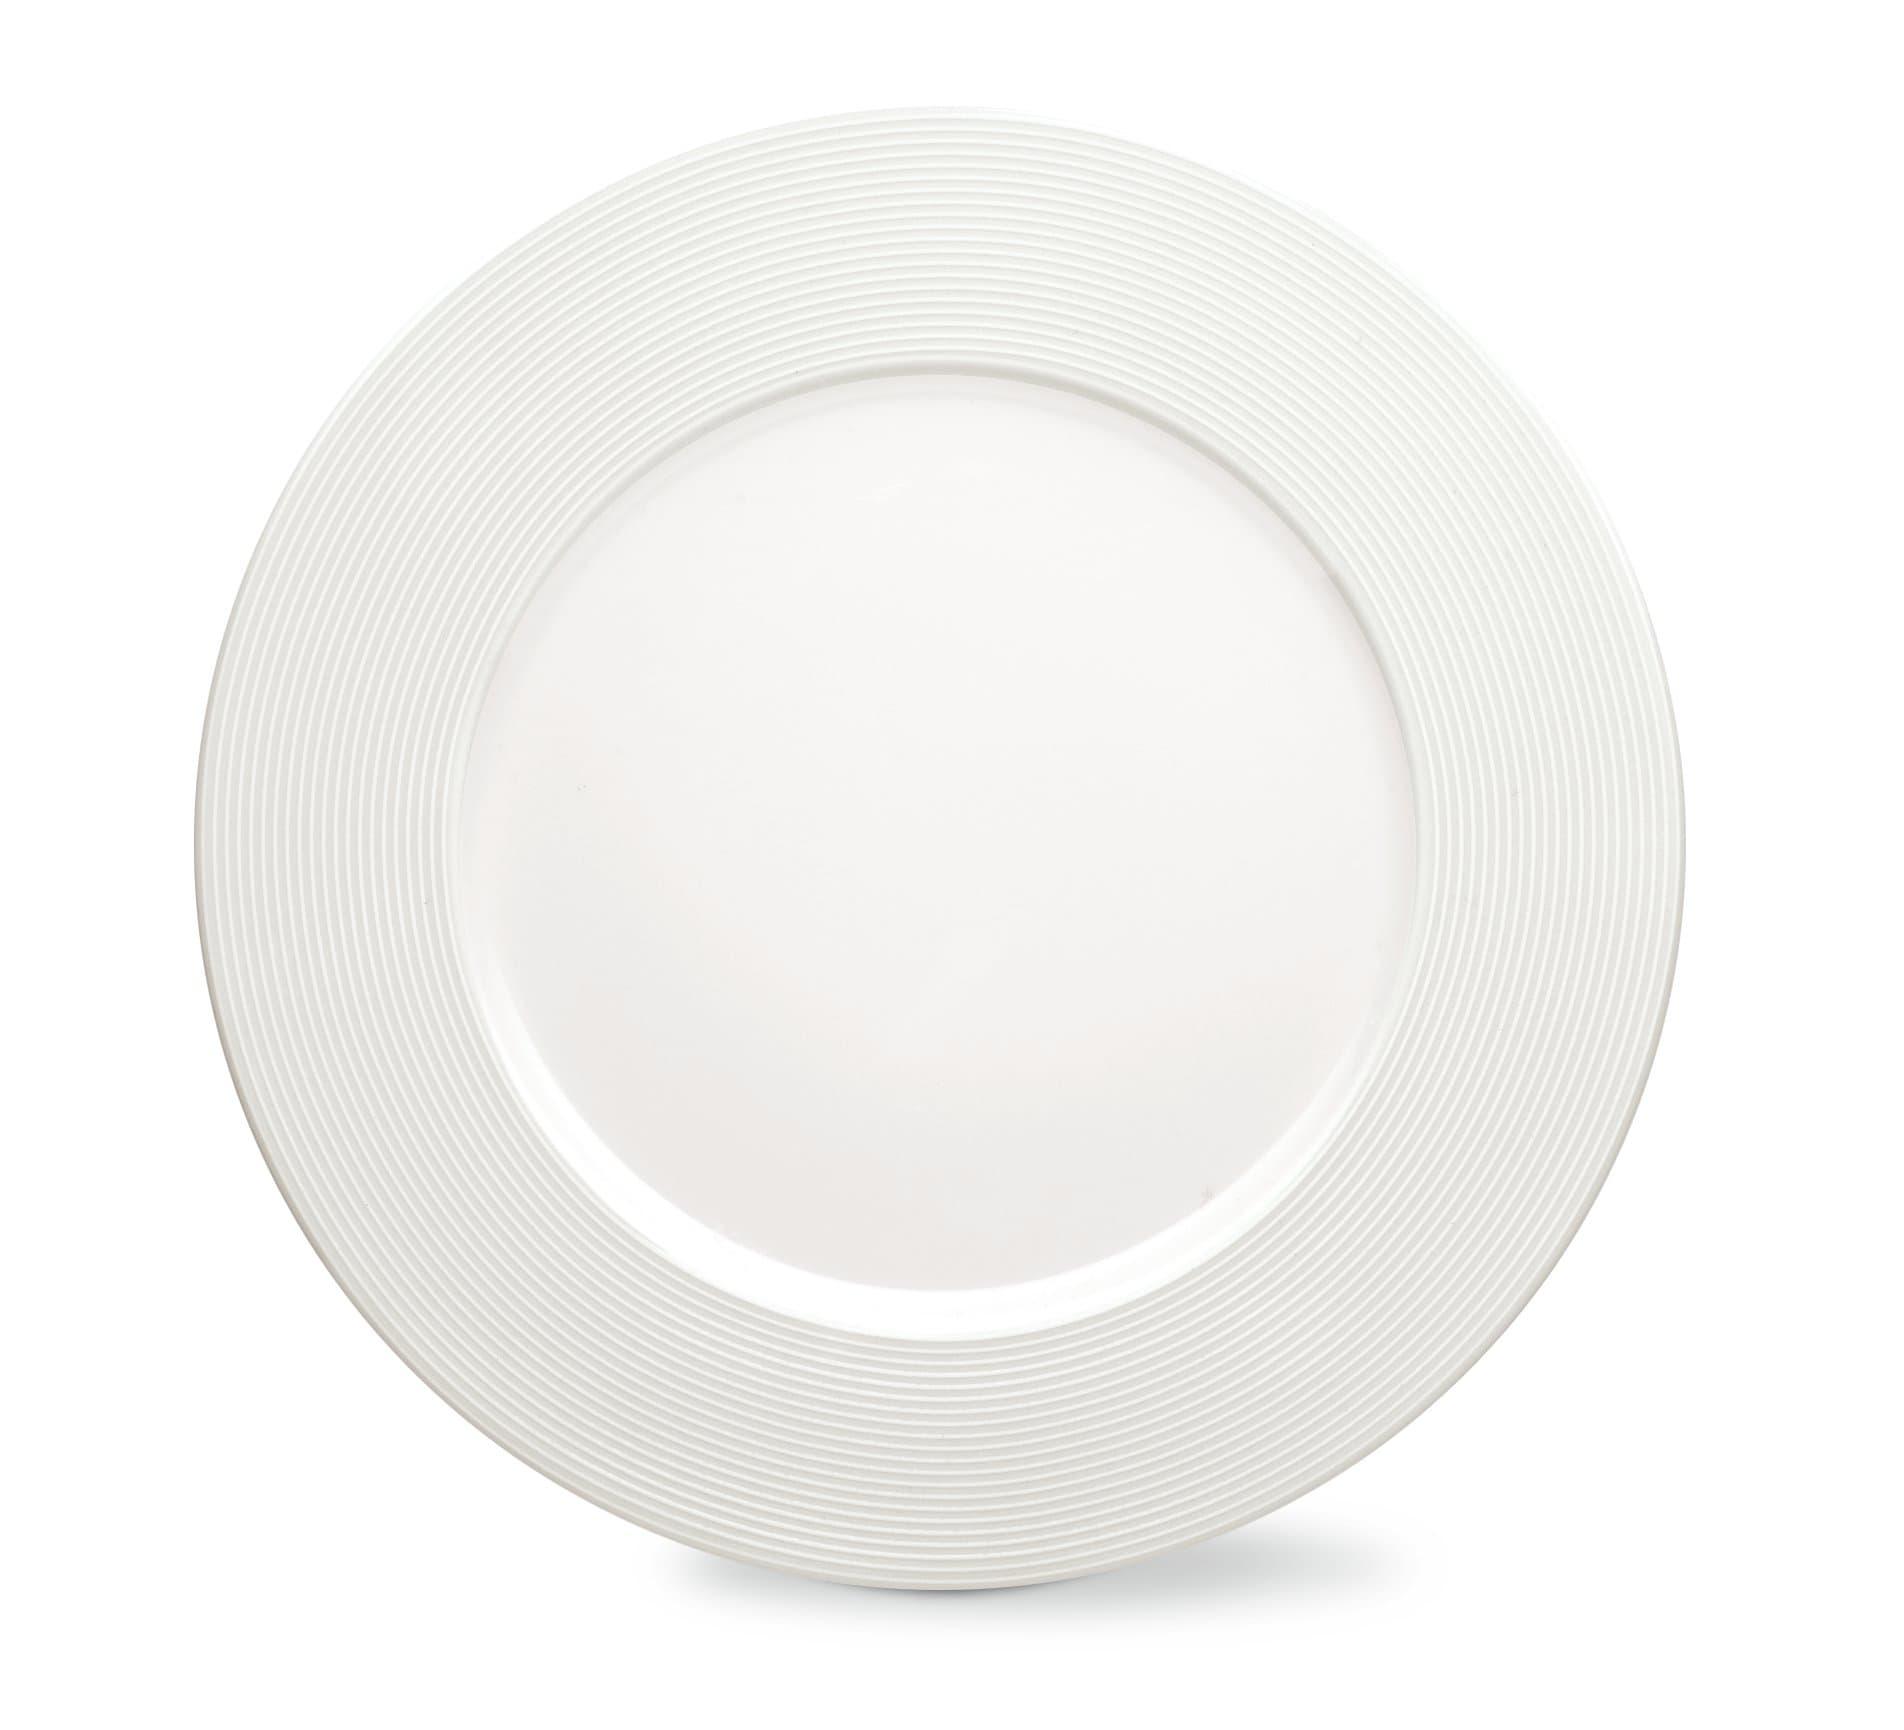 Cucina & Tavola VIENNA Teller flach